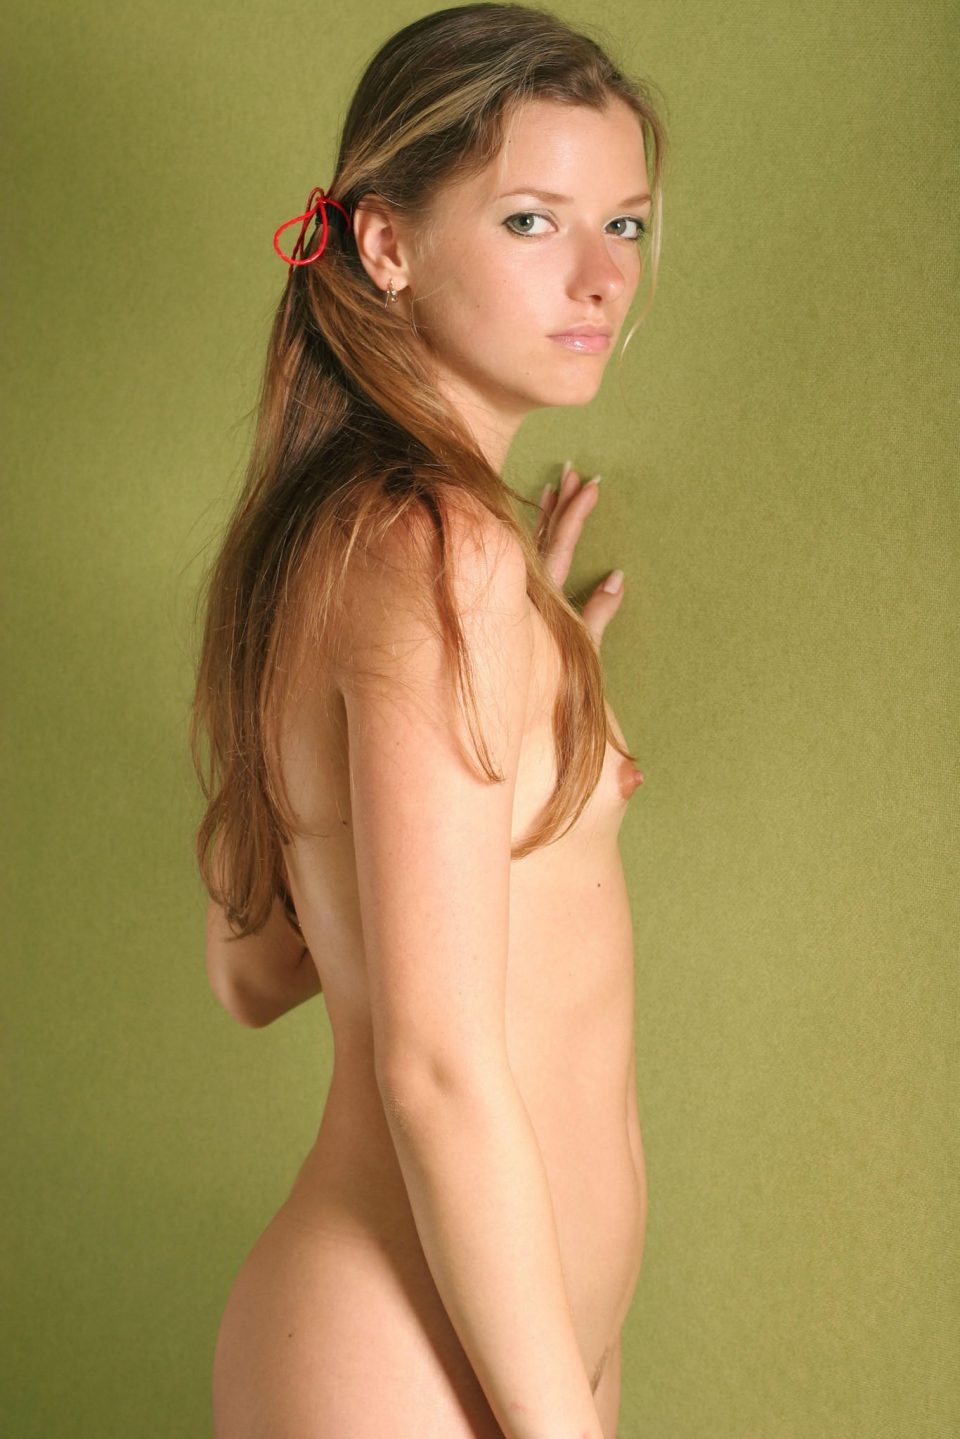 strange nude sex gifs